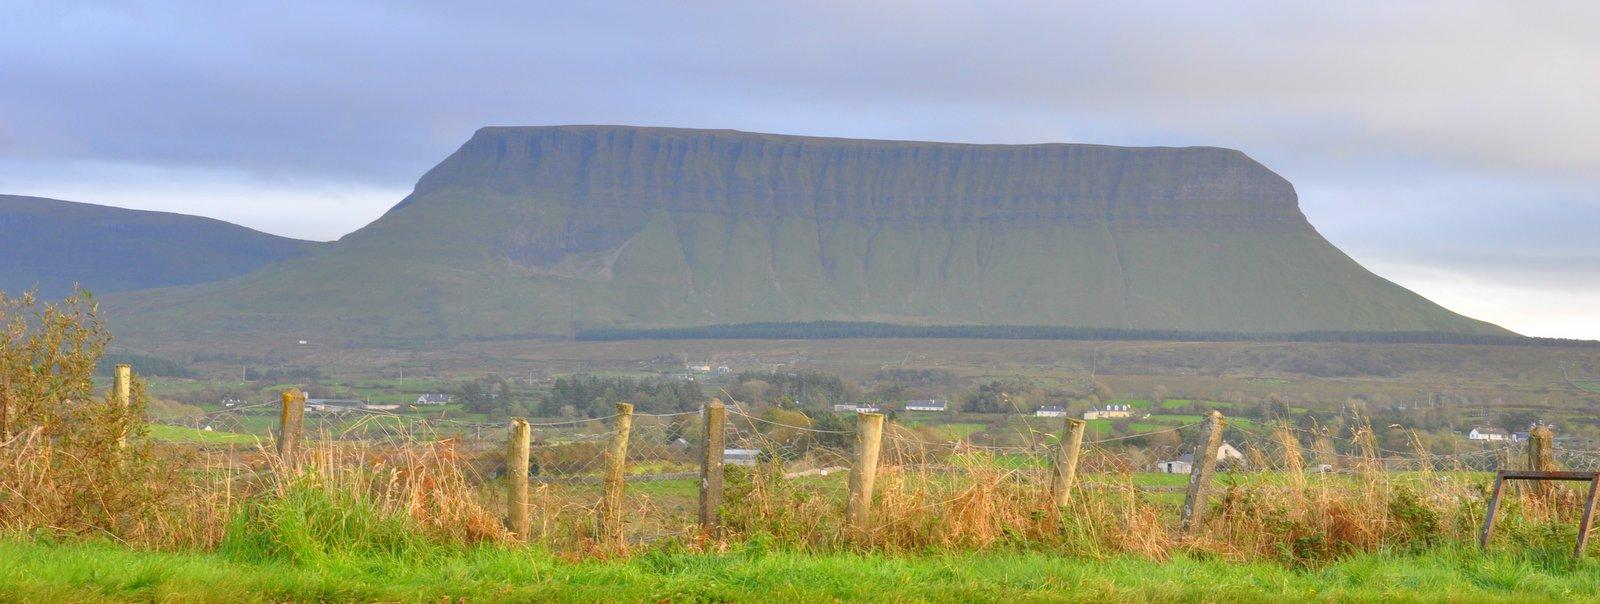 La montagne Ben Bulben près de Sligo